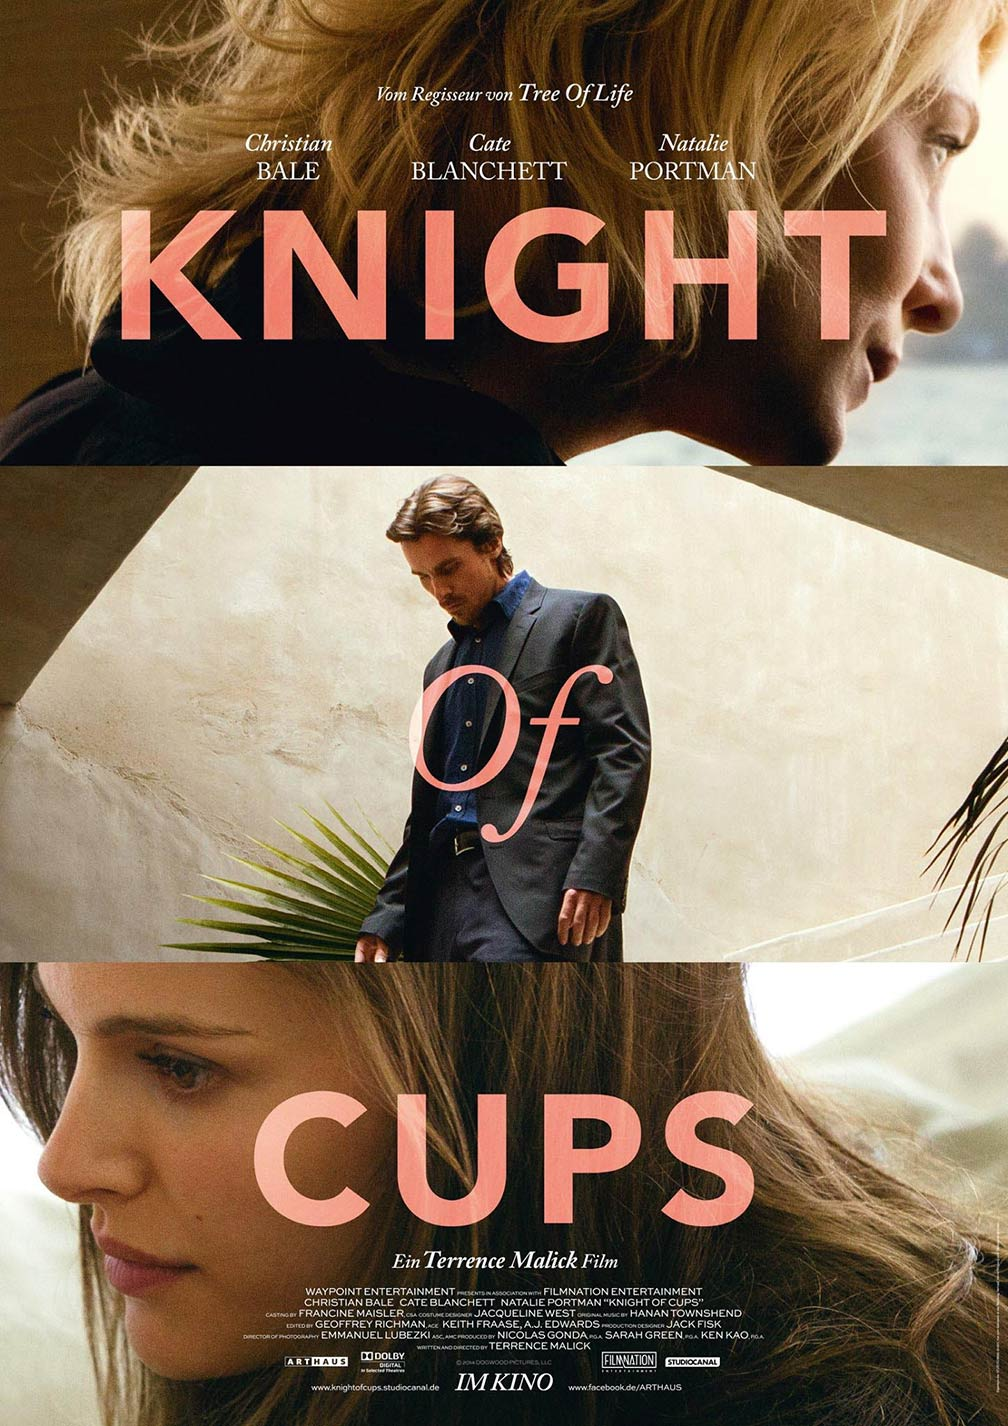 مشاهدة فيلم 2016 Knight of Cups  مترجم اون لاين و تحميل مباشر